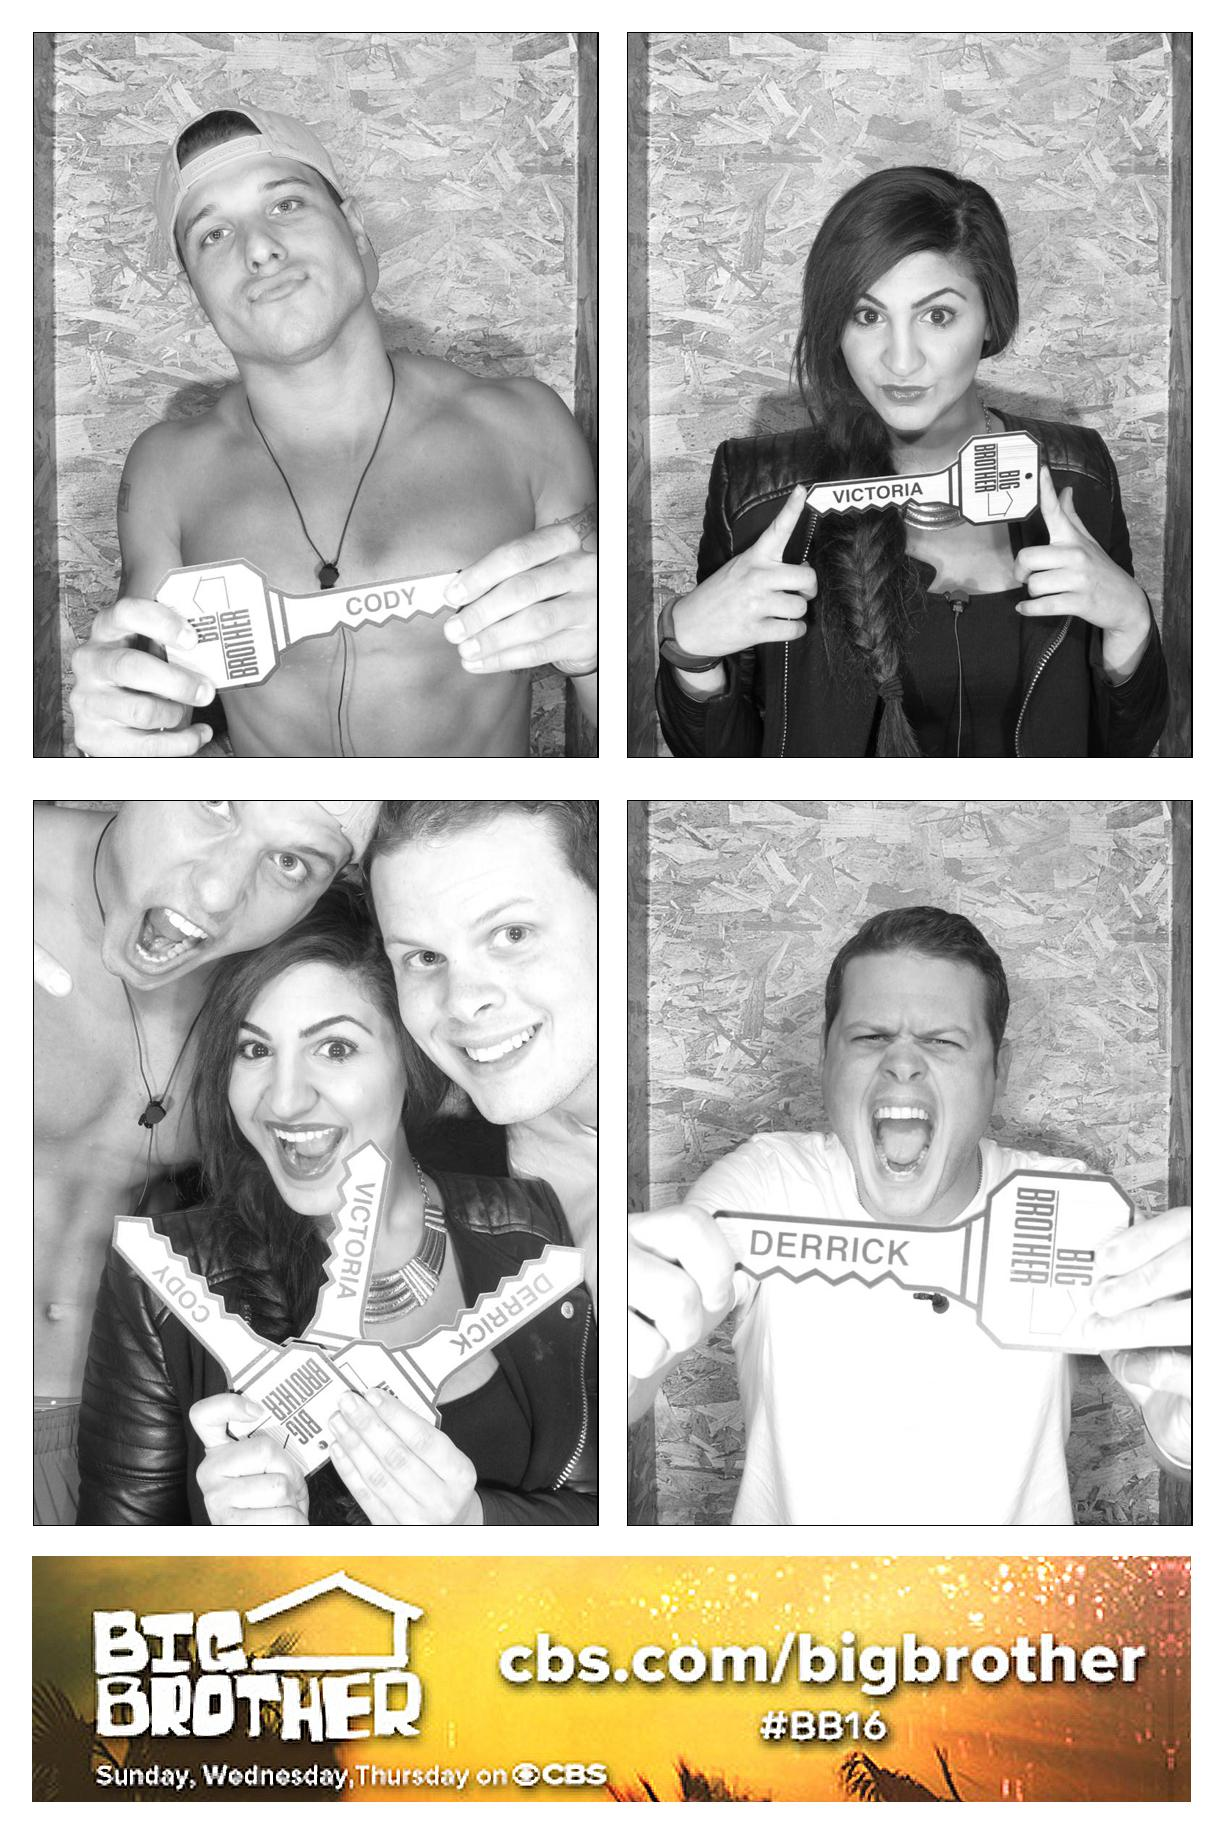 Cody, Victoria and Derrick